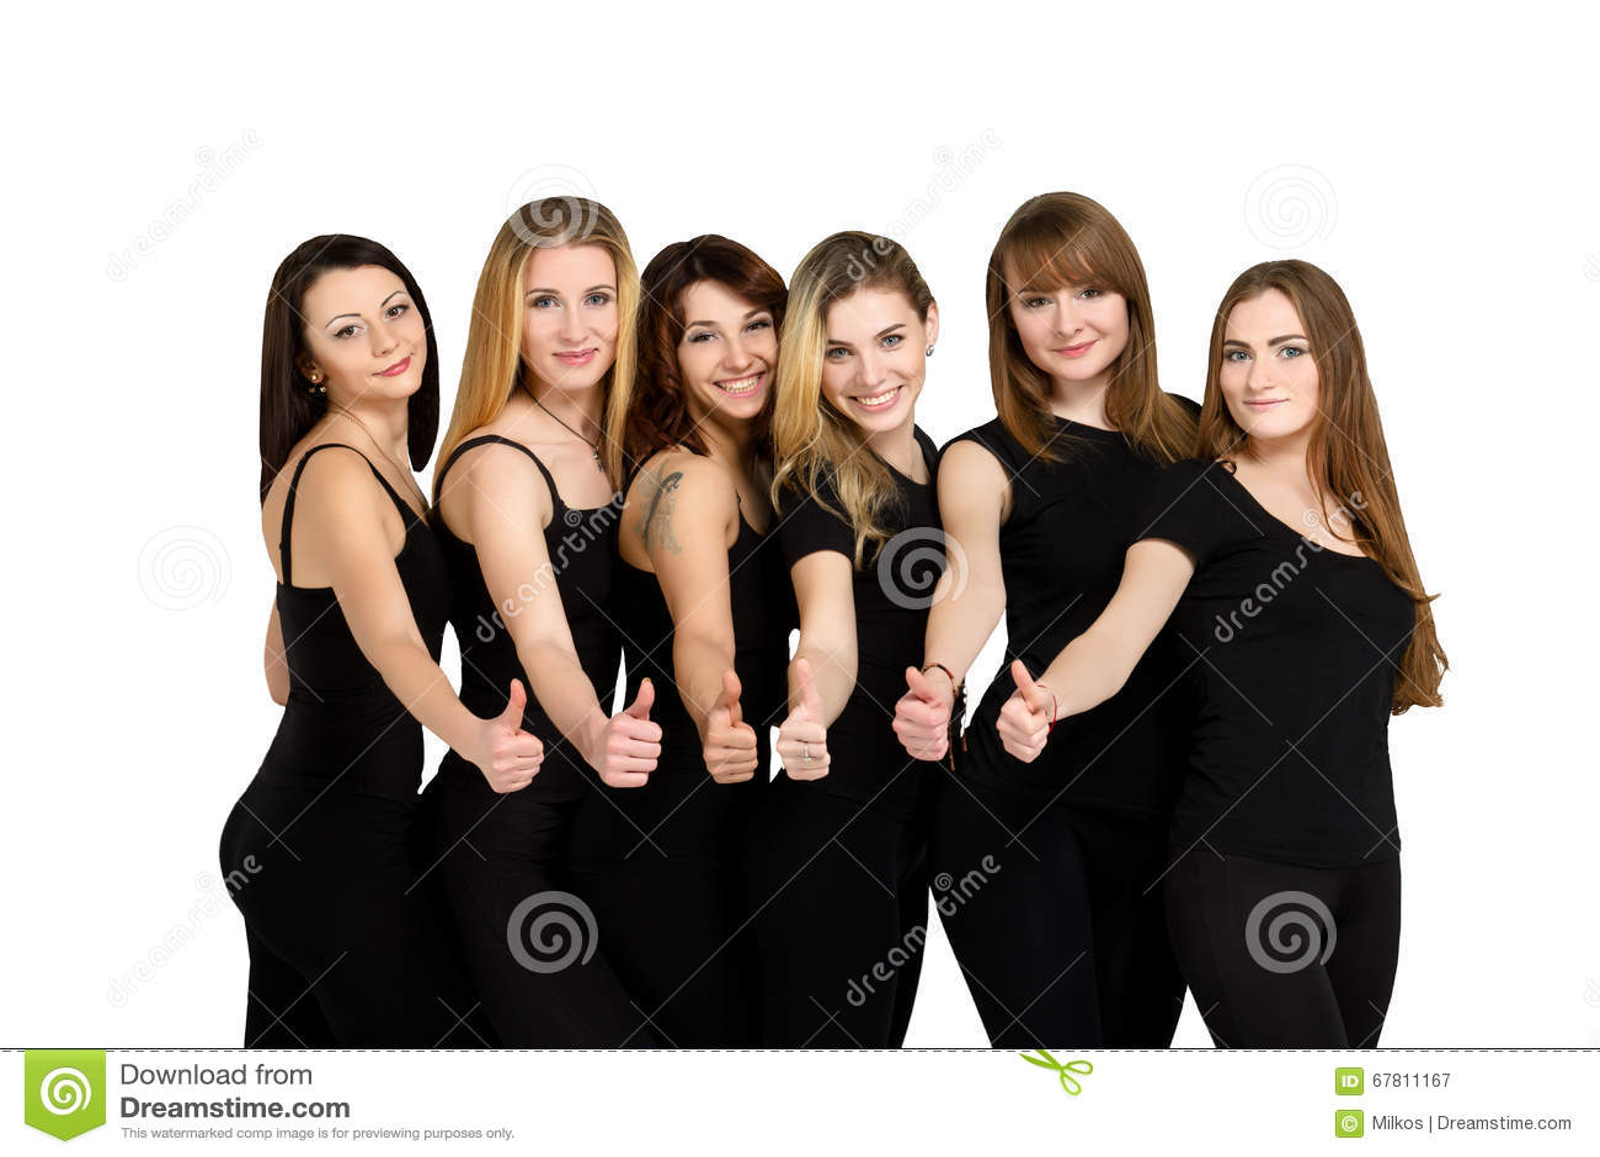 escort de putas buscar putas baratas